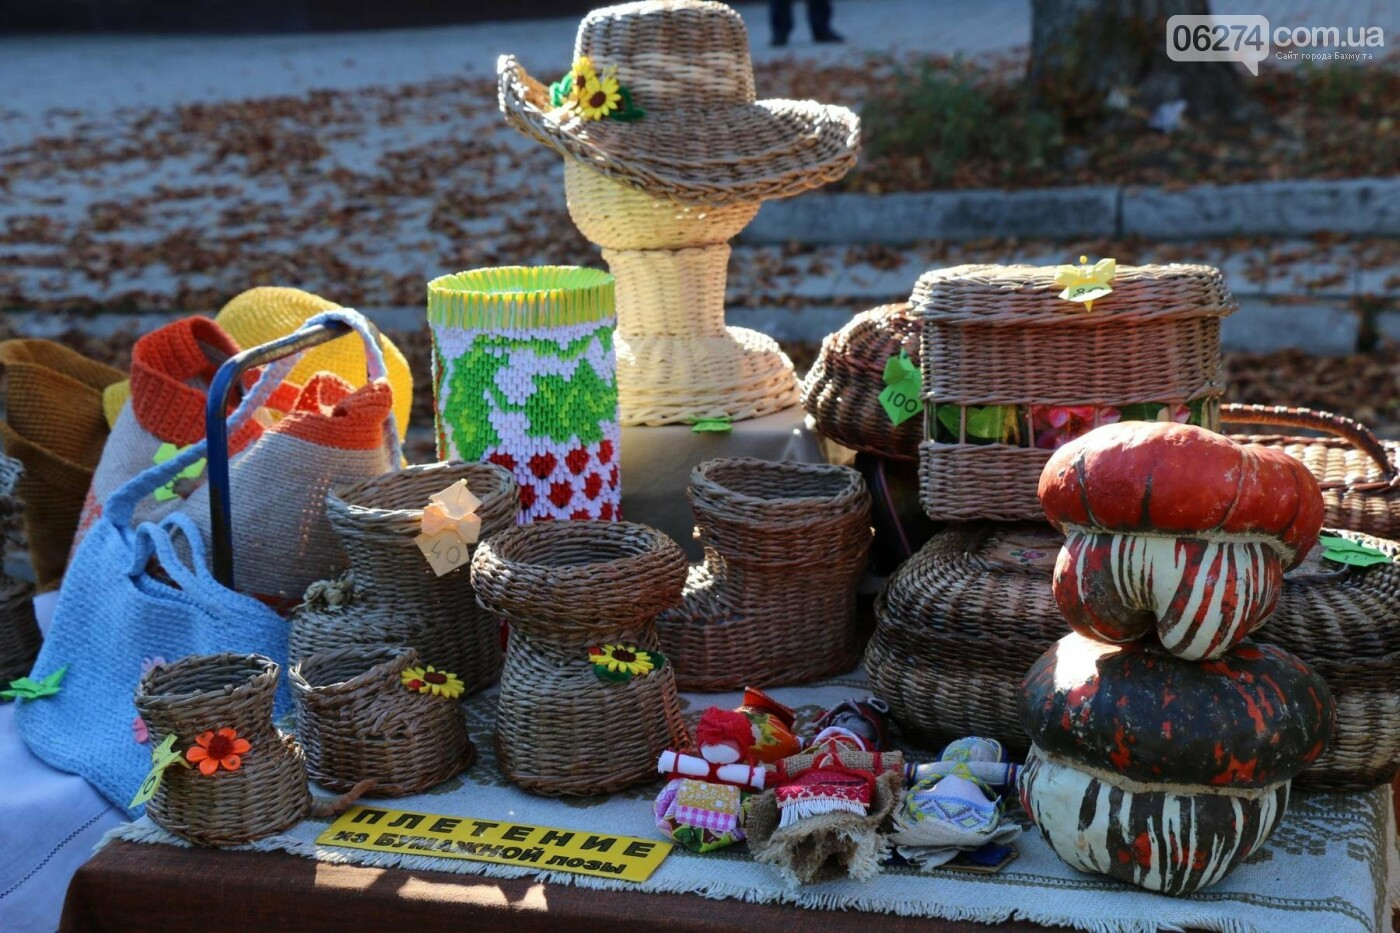 В Бахмуте прошла ярмарка «День садовода» (ФОТО), фото-13